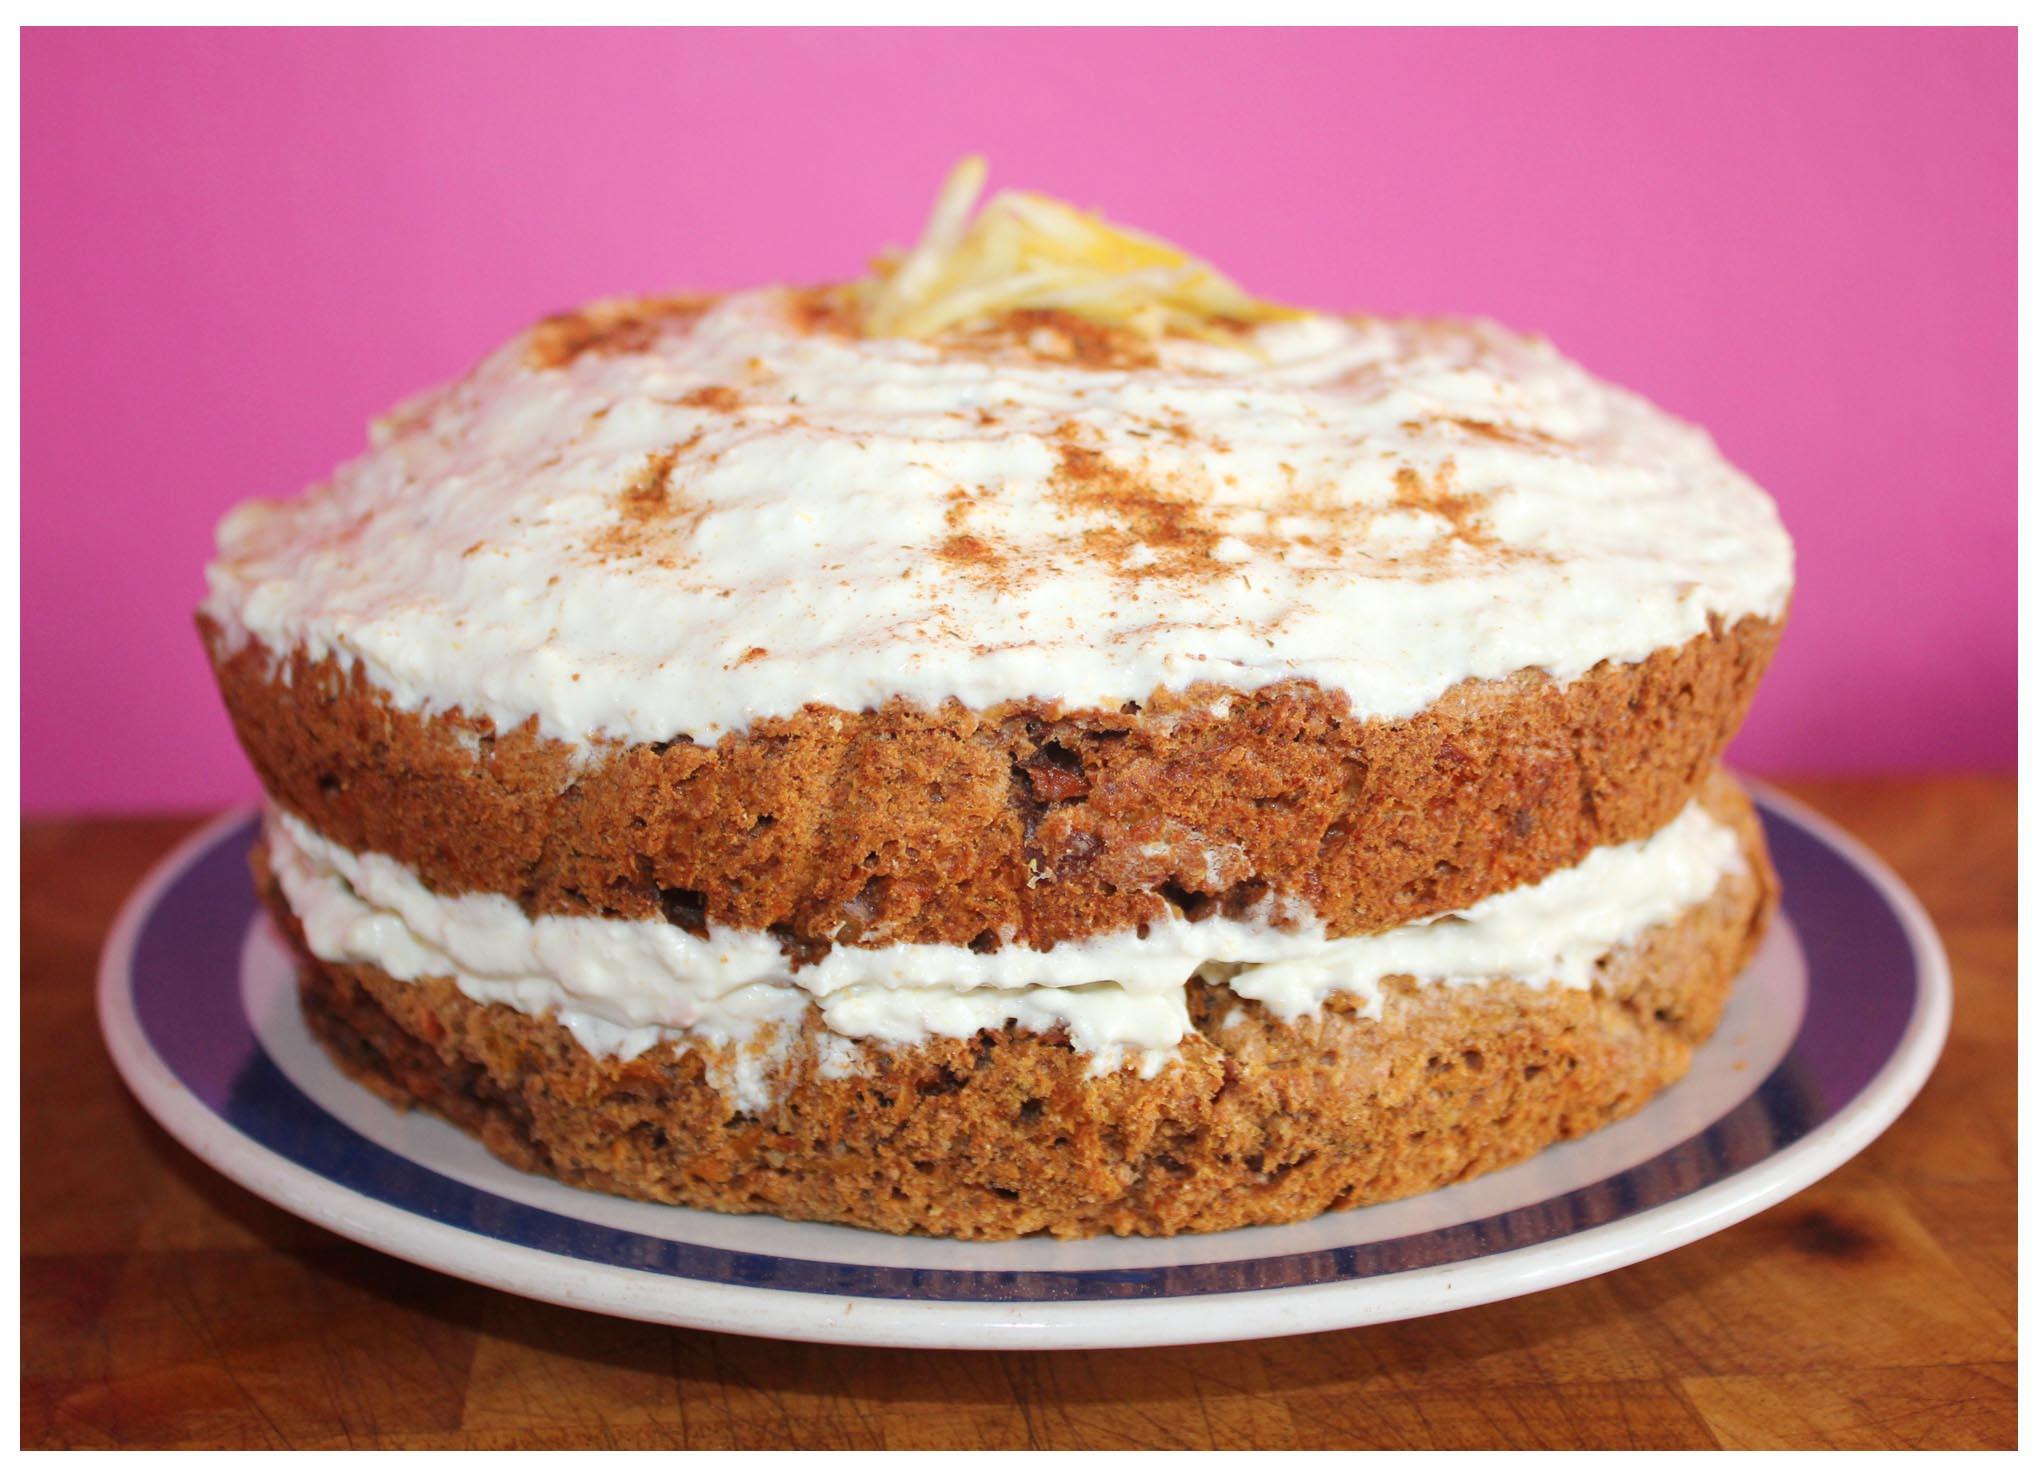 Sugar Free Cake Recipe  Recipe for Carrot Banana Vanilla Sponge Carrot Fruit Cake